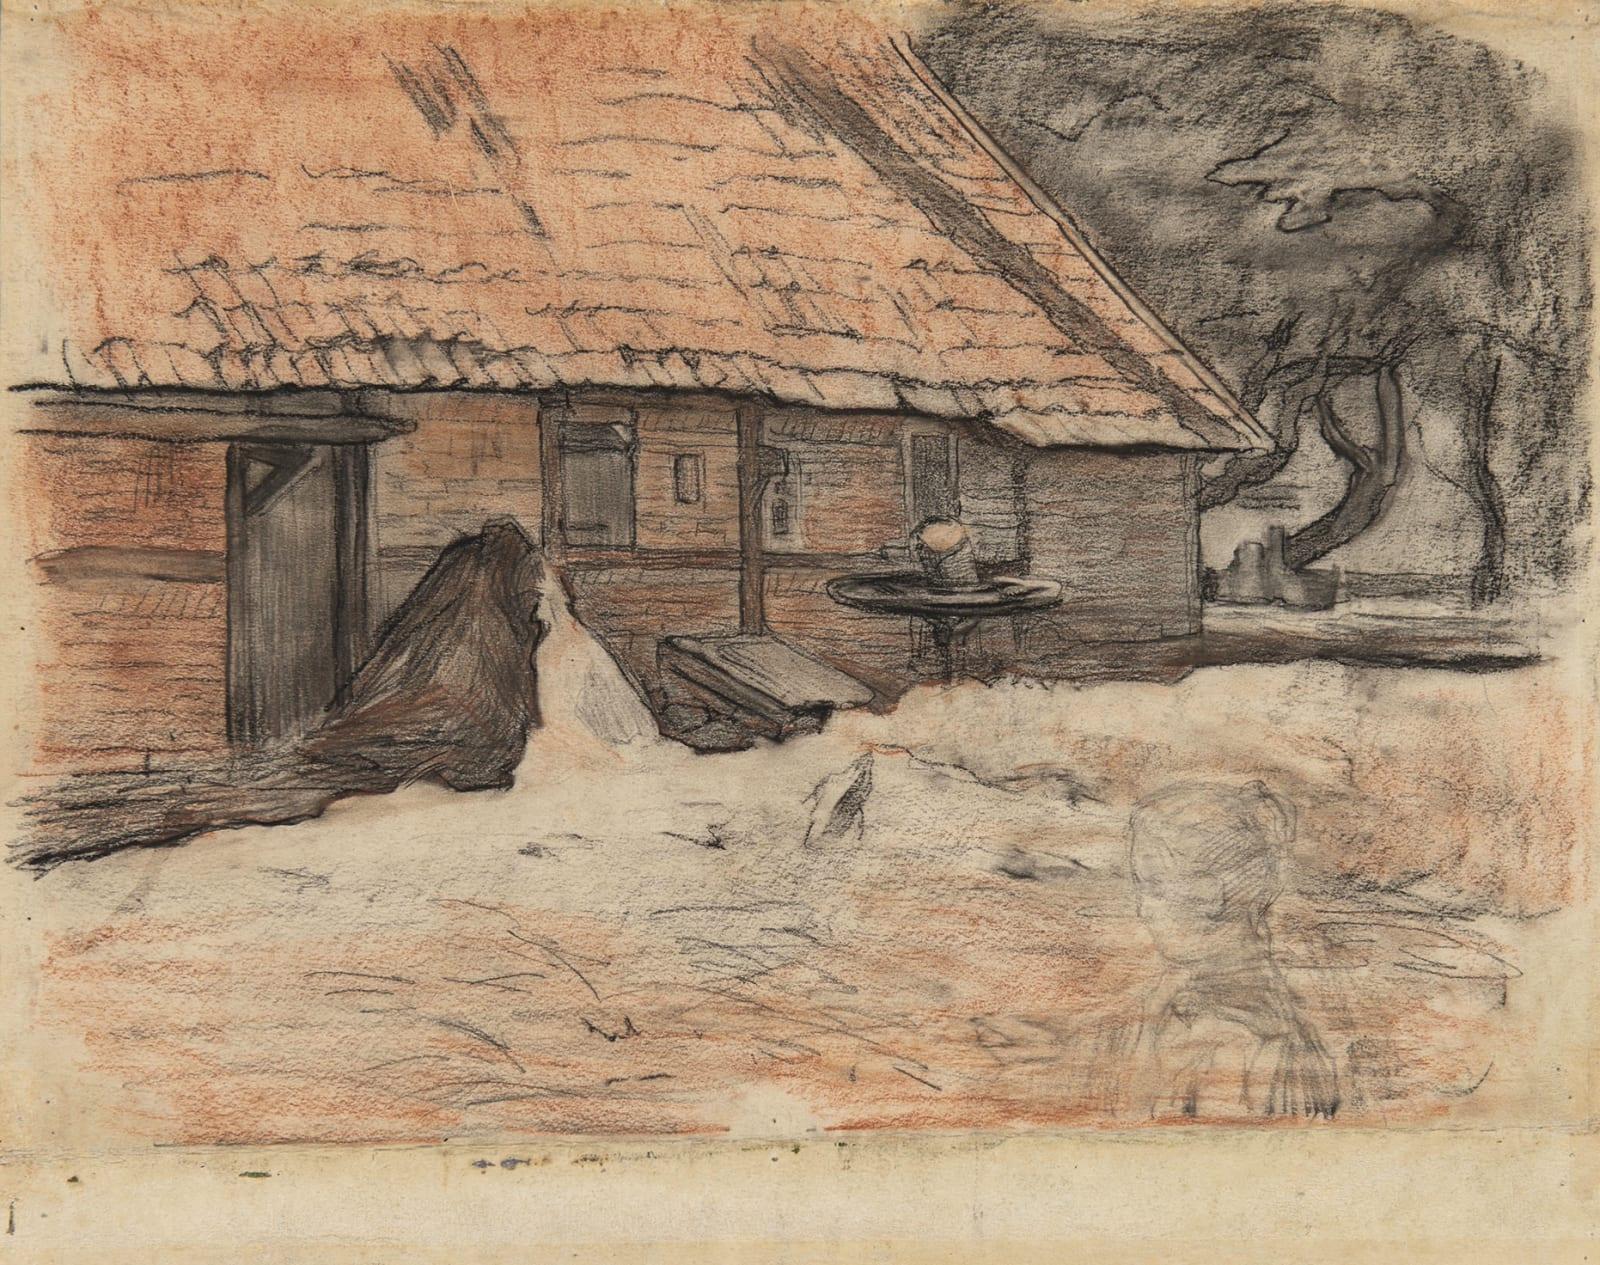 PIET MONDRIAN, Vue d'une ferme à Winterswijk, circa 1898-1899